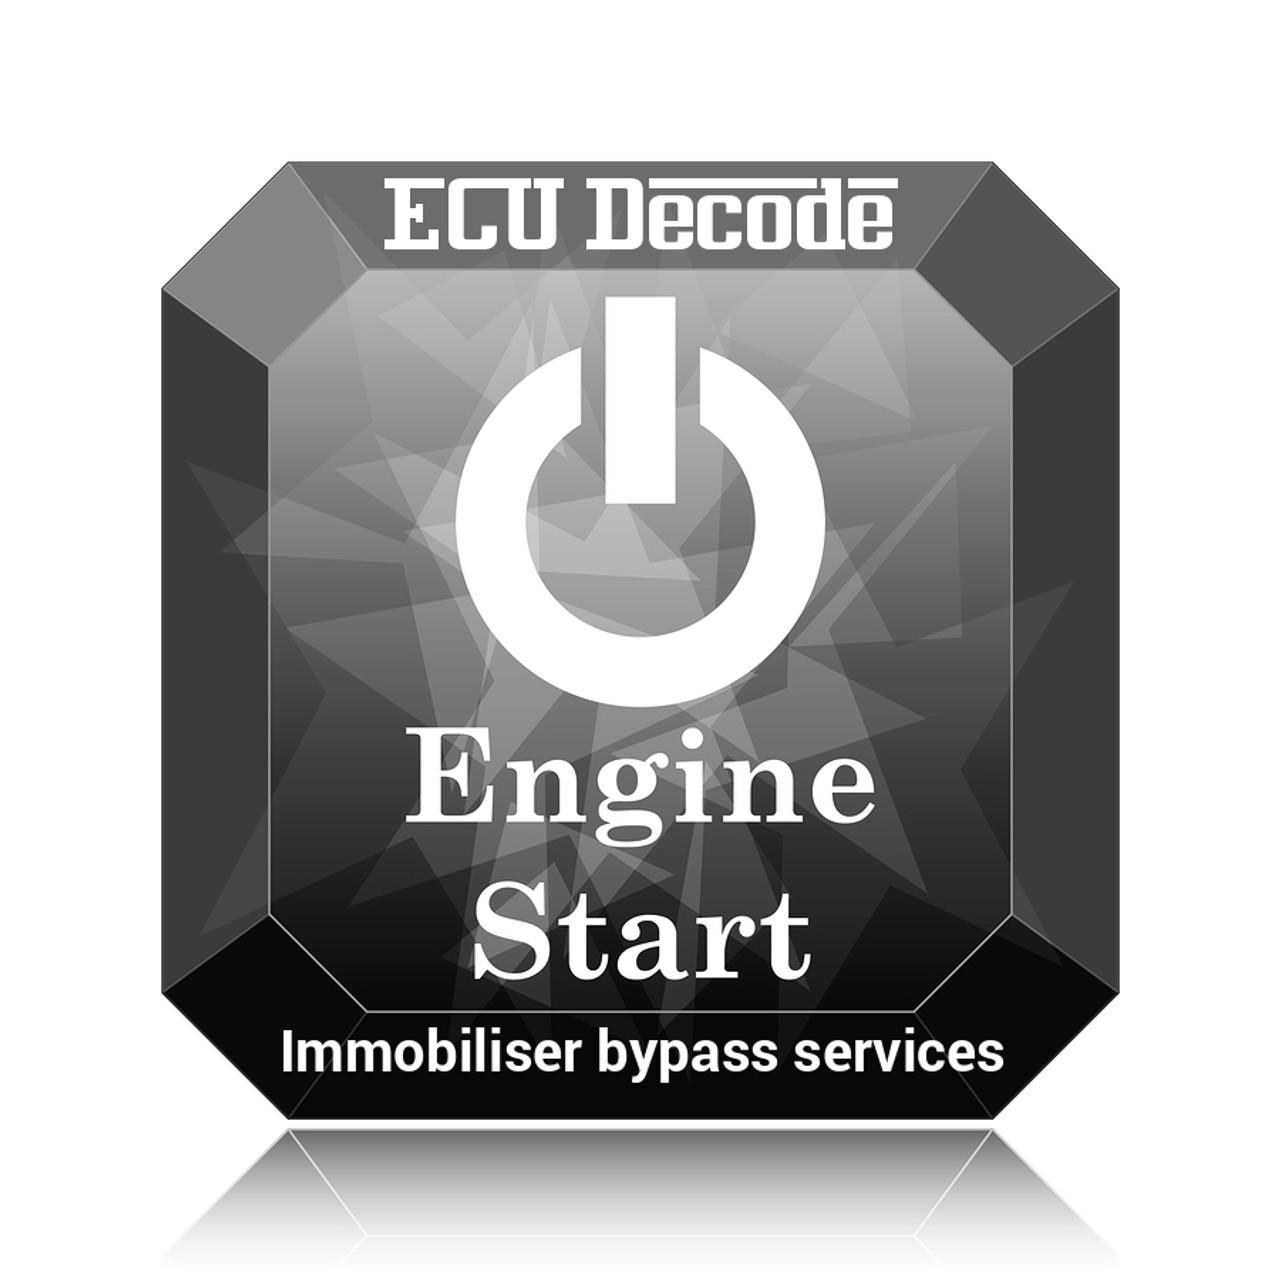 Chrysler Immobiliser Bypass - Immo Off Services  ECU Decode Tel 01373 302412